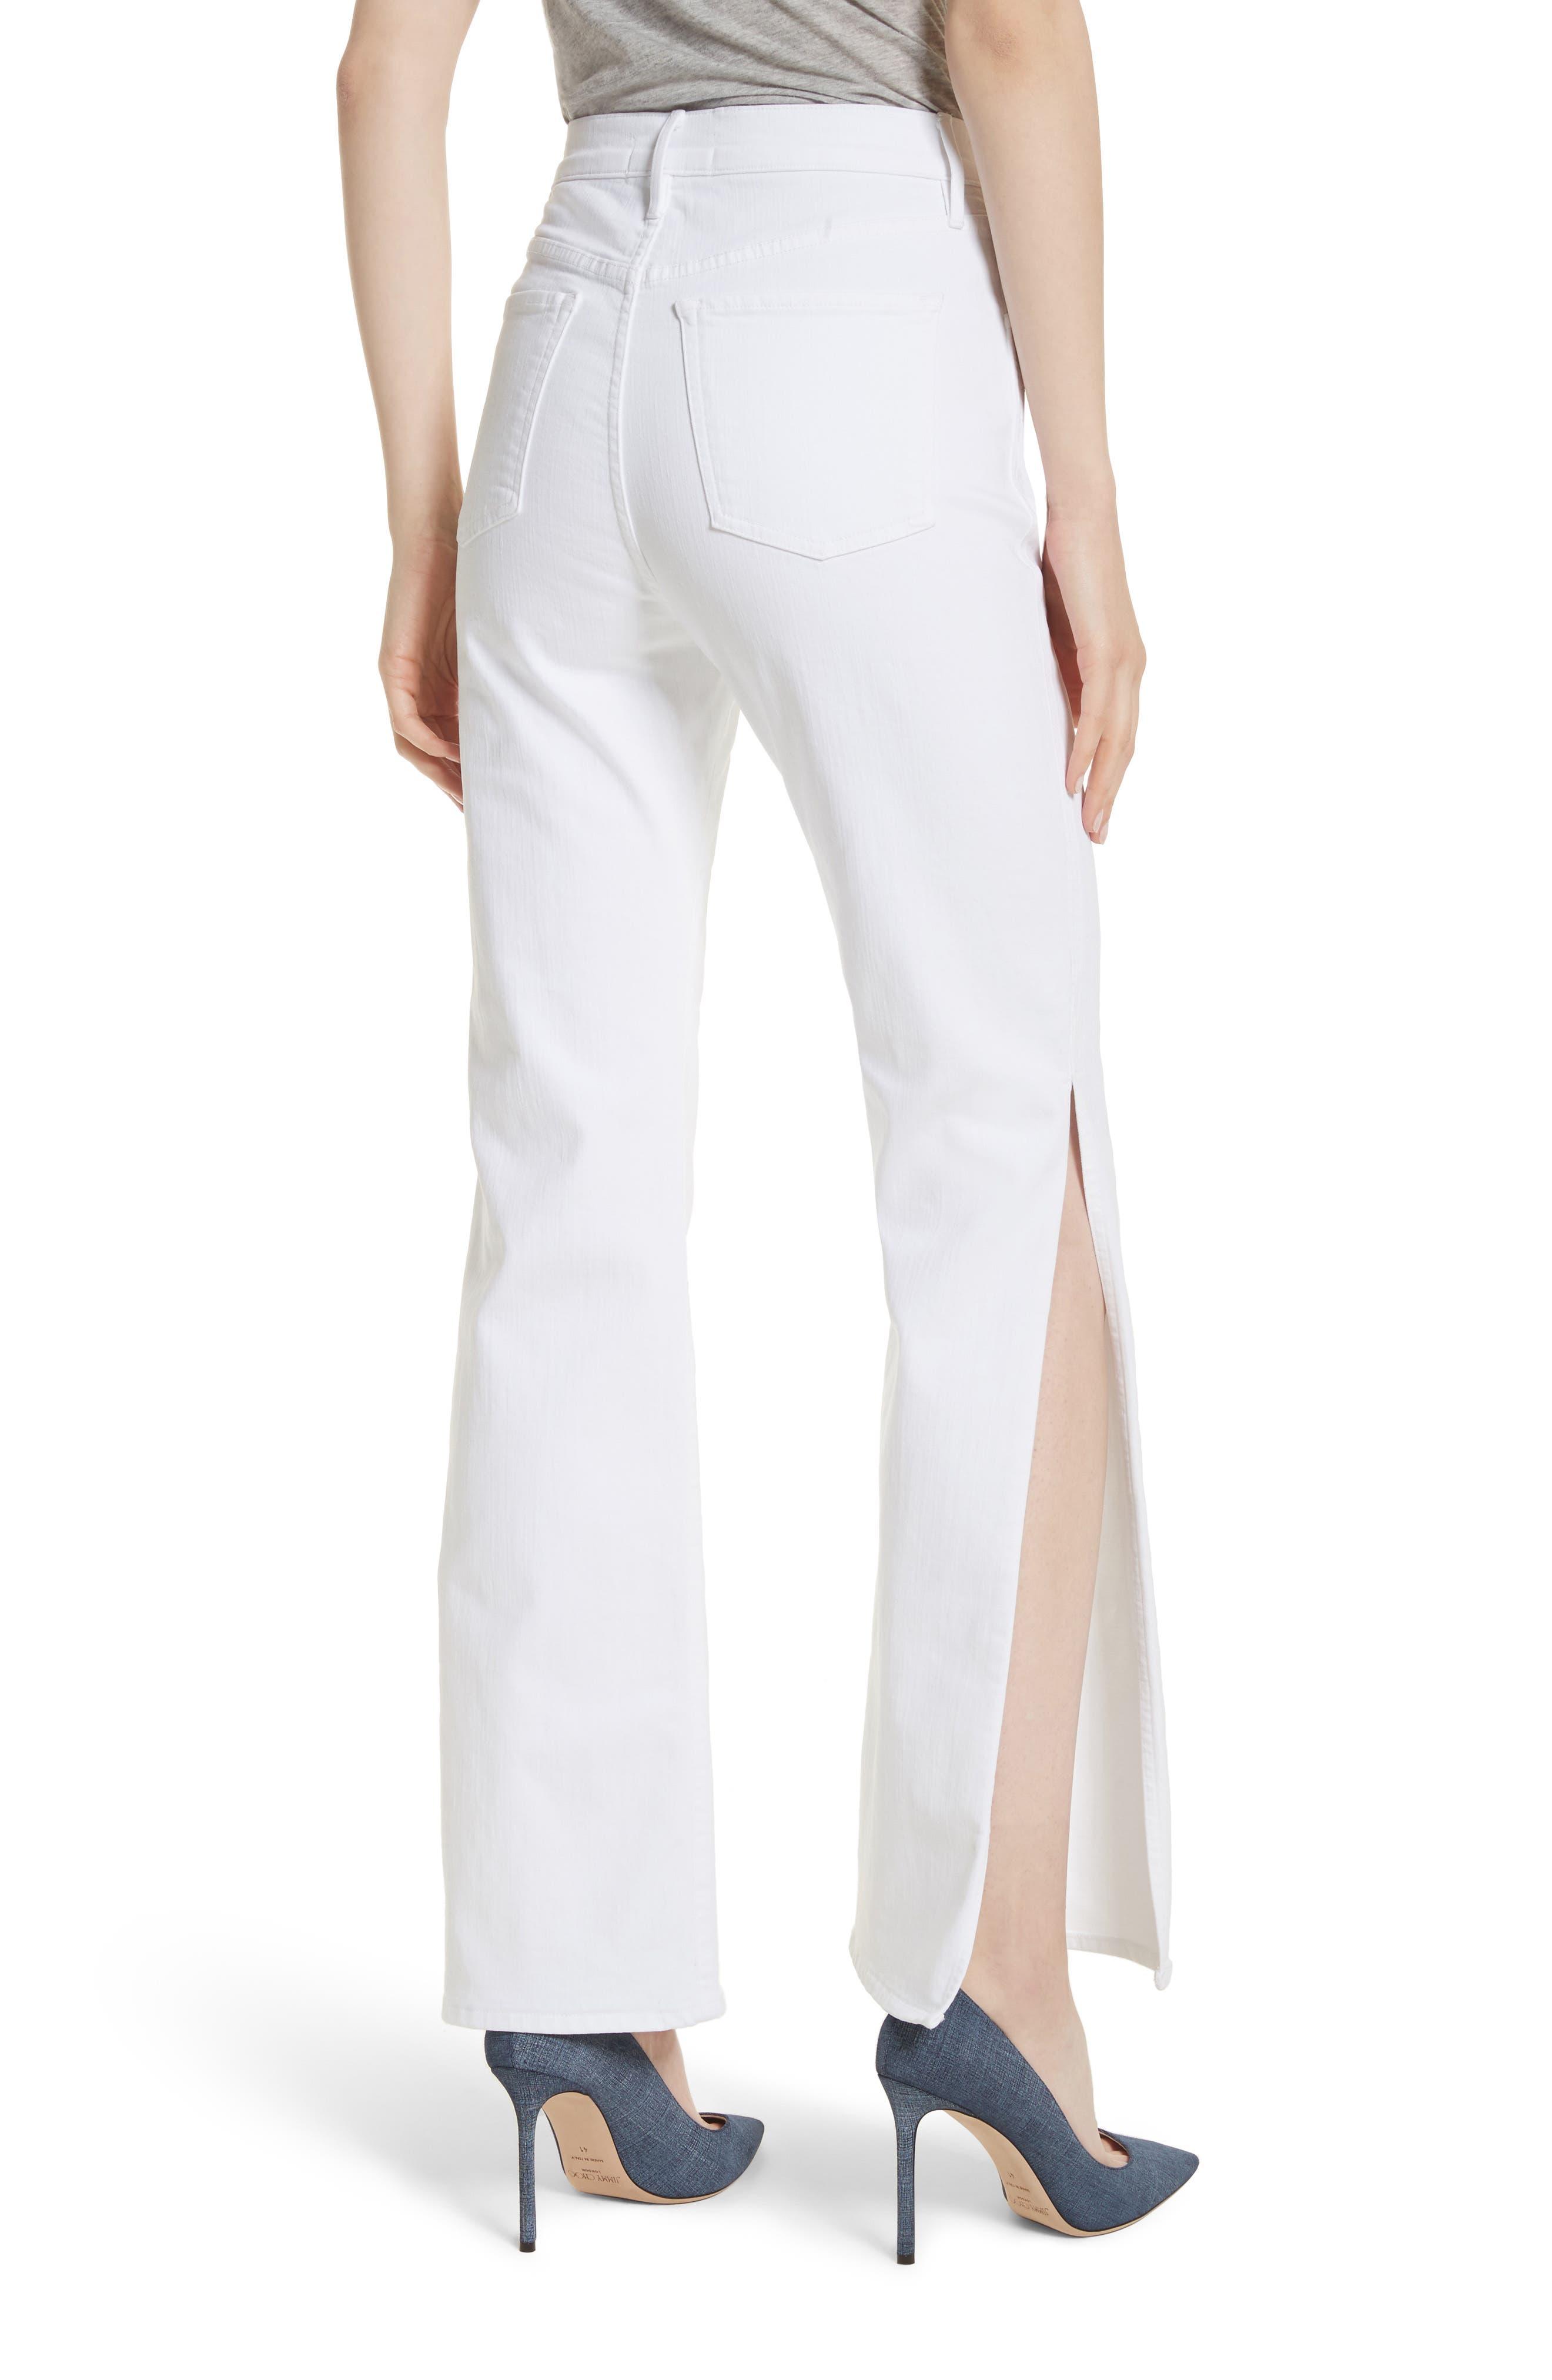 W4 Adeline Split Leg Flare Jeans,                             Alternate thumbnail 2, color,                             ASPRO